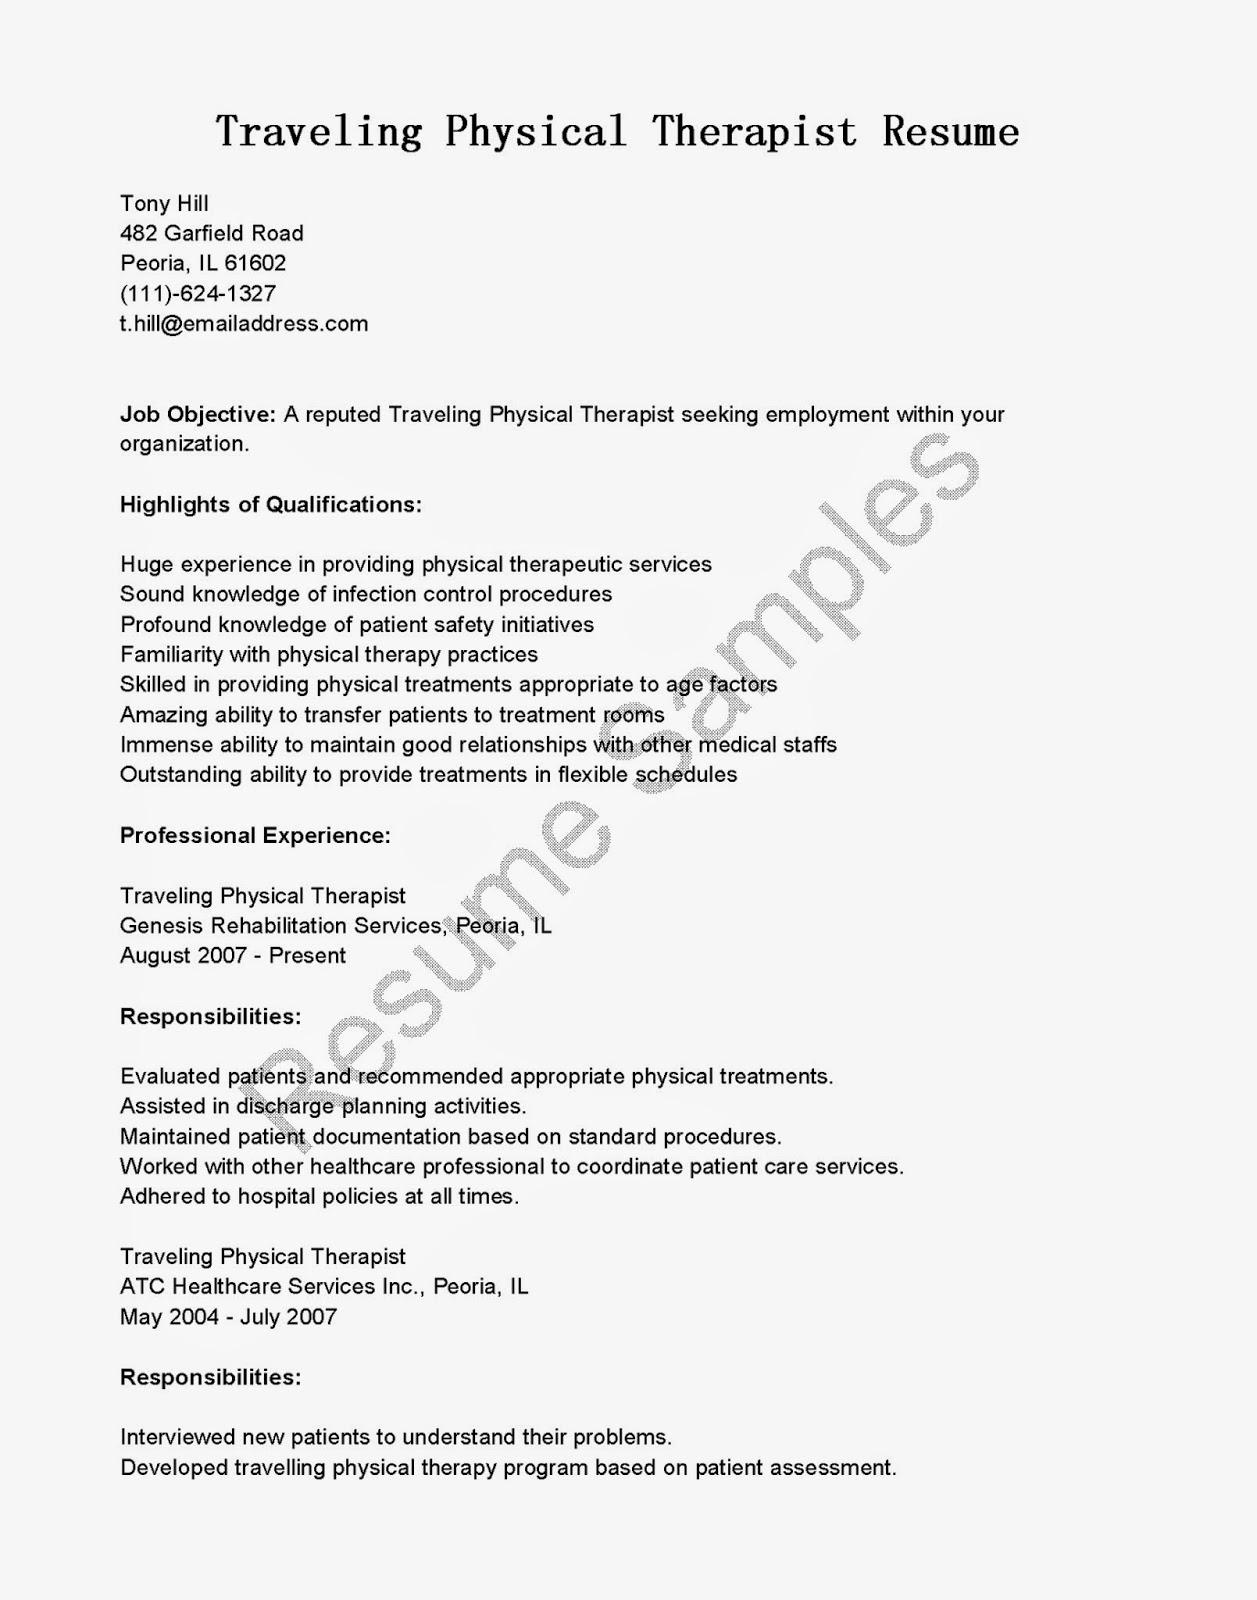 Health Care Reform Essay Custom Occupational Therapy Essay Science Essay Example also Healthy Diet Essay A Career In Occupational Therapy Essay English Essay Internet